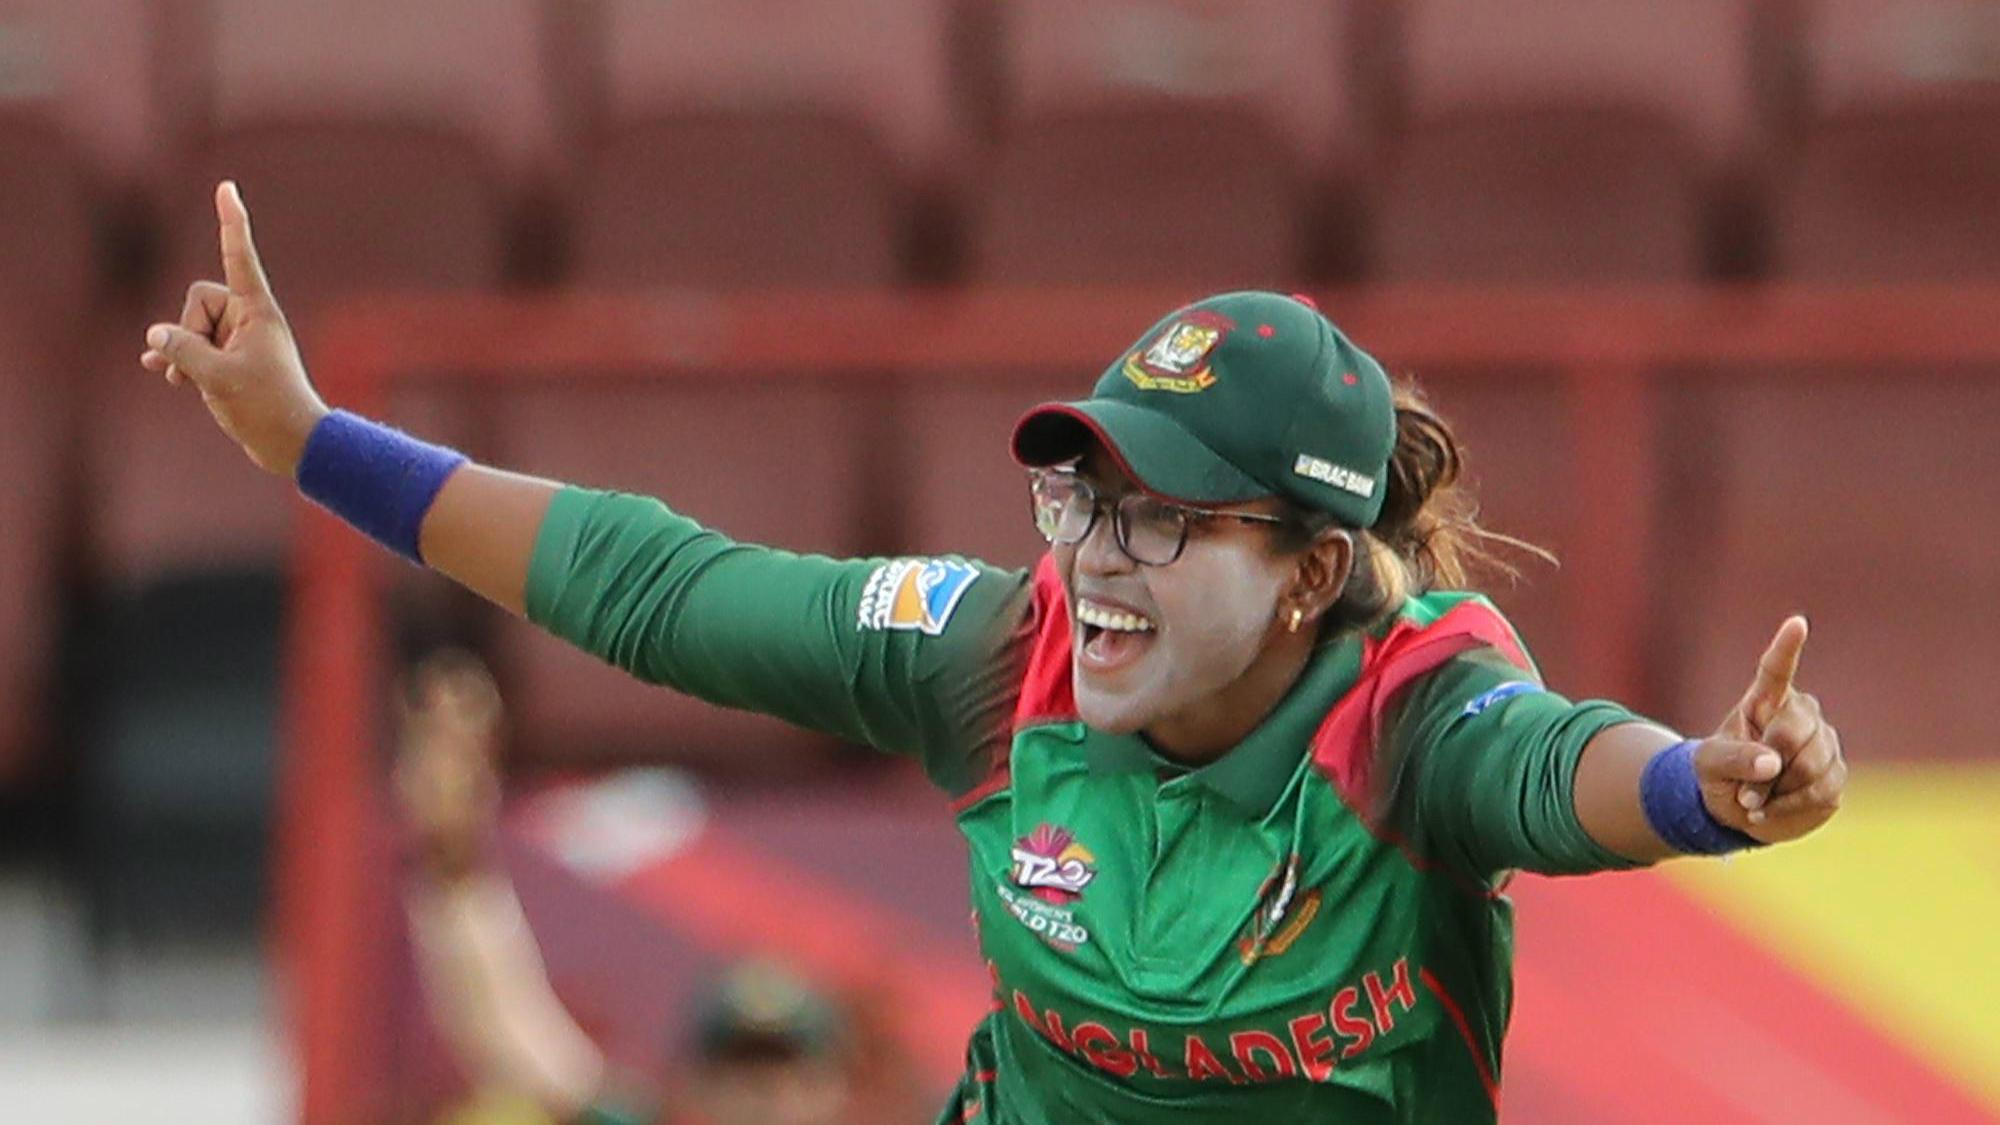 Rumana Ahmed of Bangladesh celebrates during the ICC Women's World T20 warm up match between Bangladesh and Ireland on November 4, 2018 at the Guyana National Stadium in Providence, Guyana.